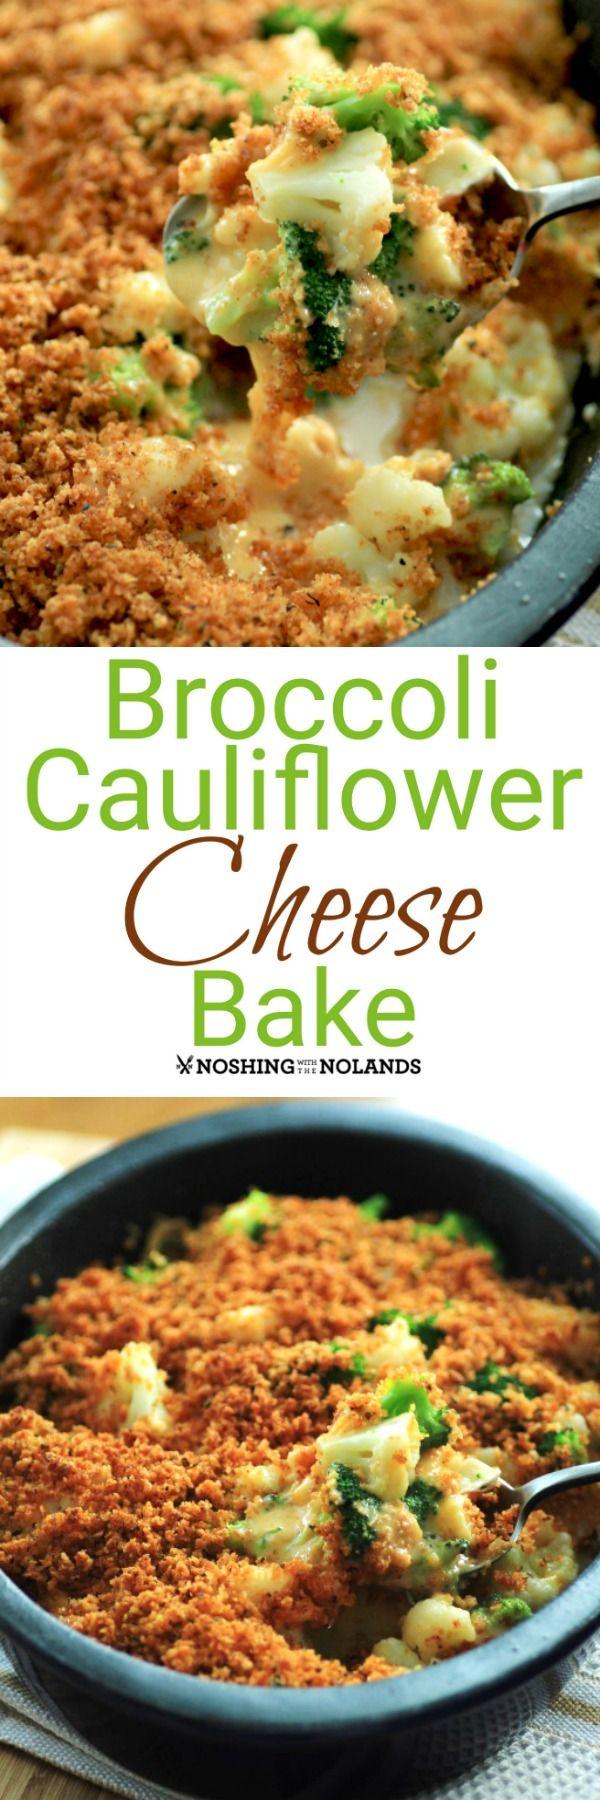 Broccoli Cauliflower Cheese Bake via @tnoland